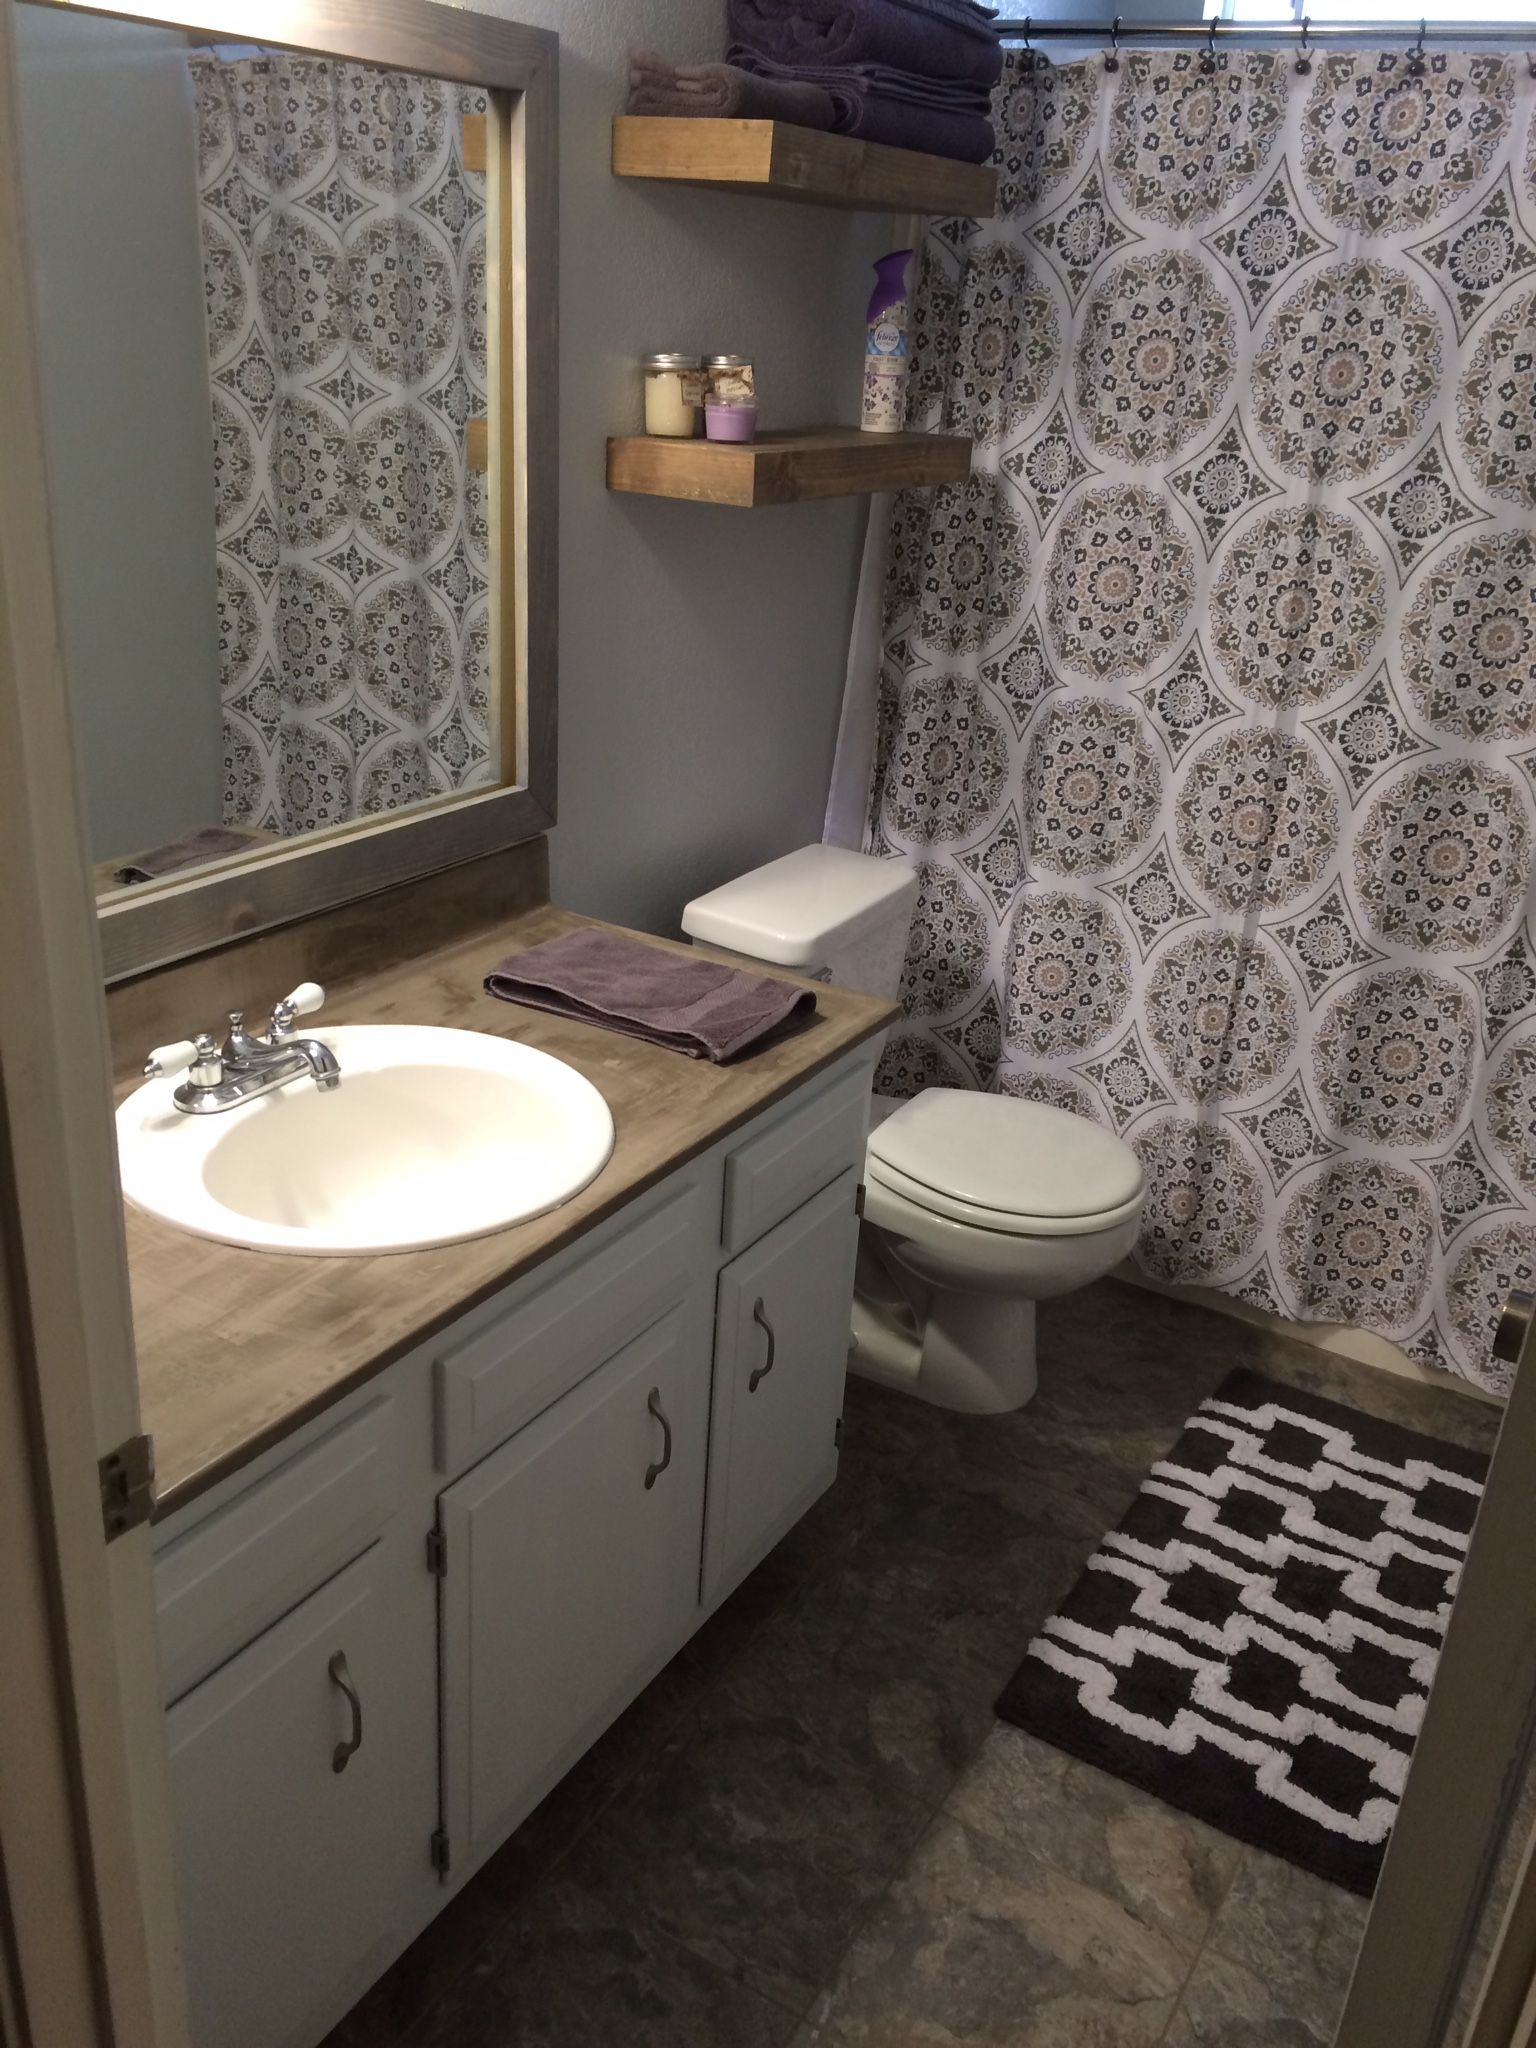 Bathroom Remodel On A Budget Vinyl Tile Floors Ardex